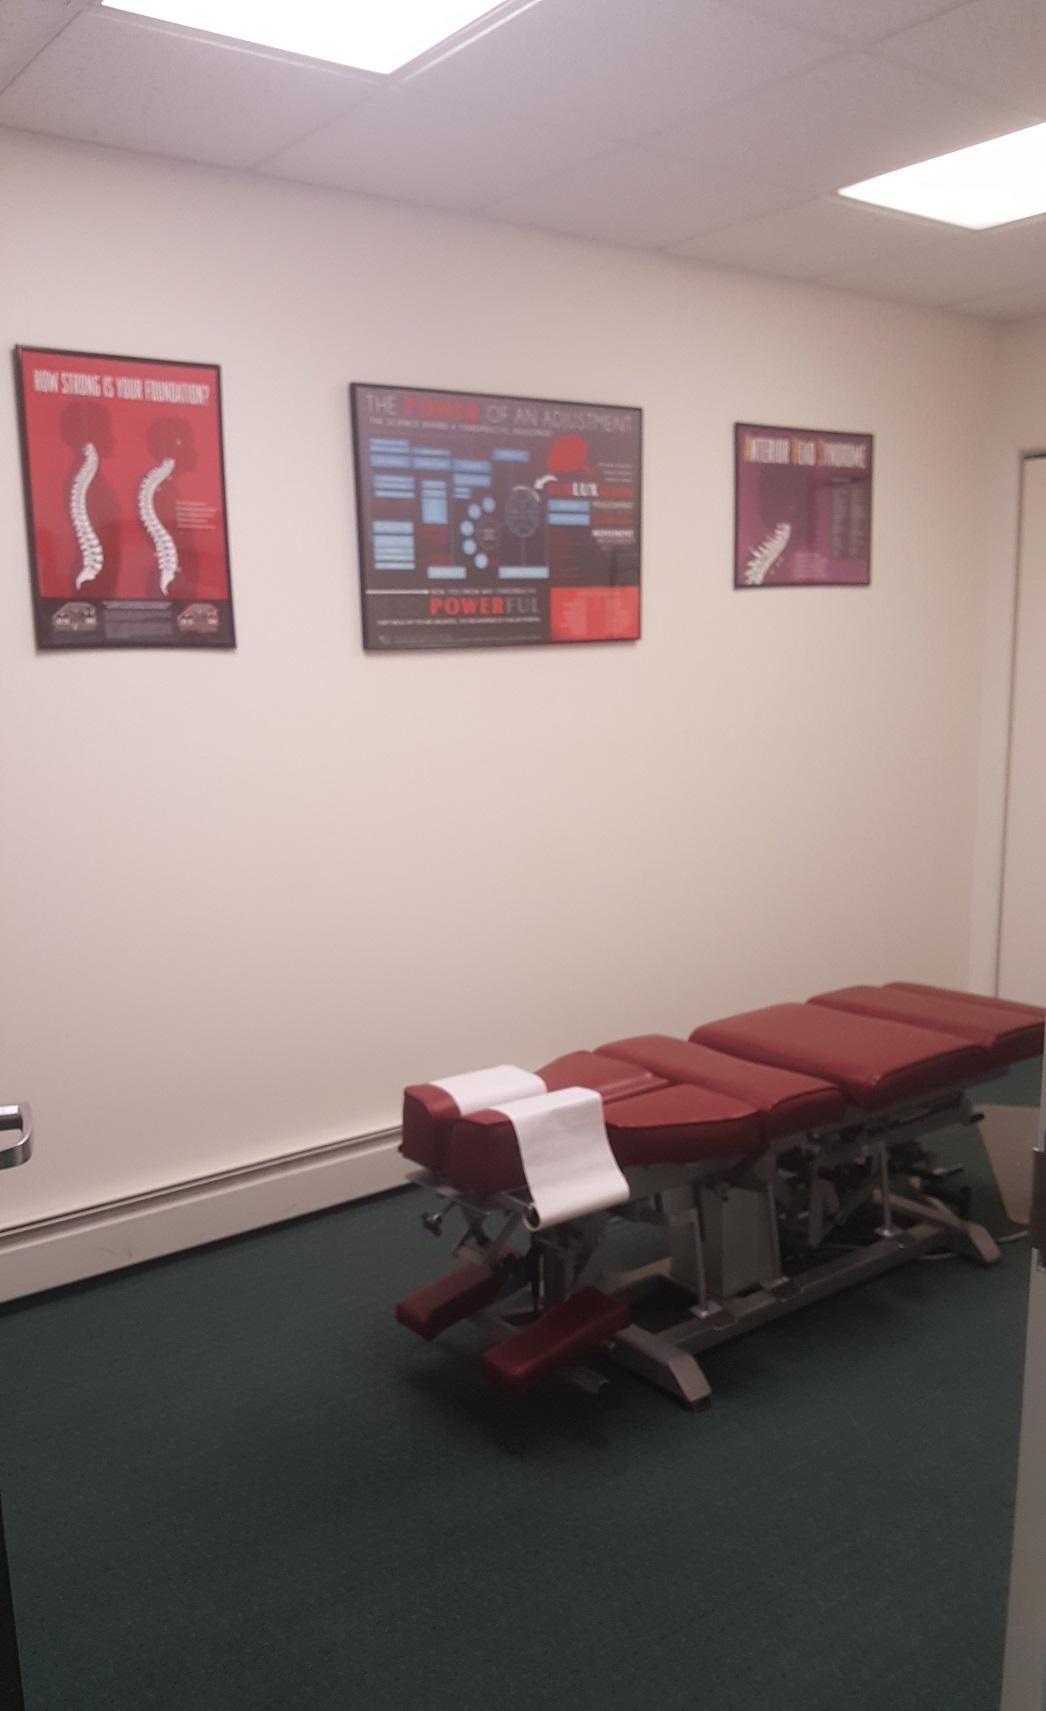 Synergy Chiropractic - Boonton, NJ